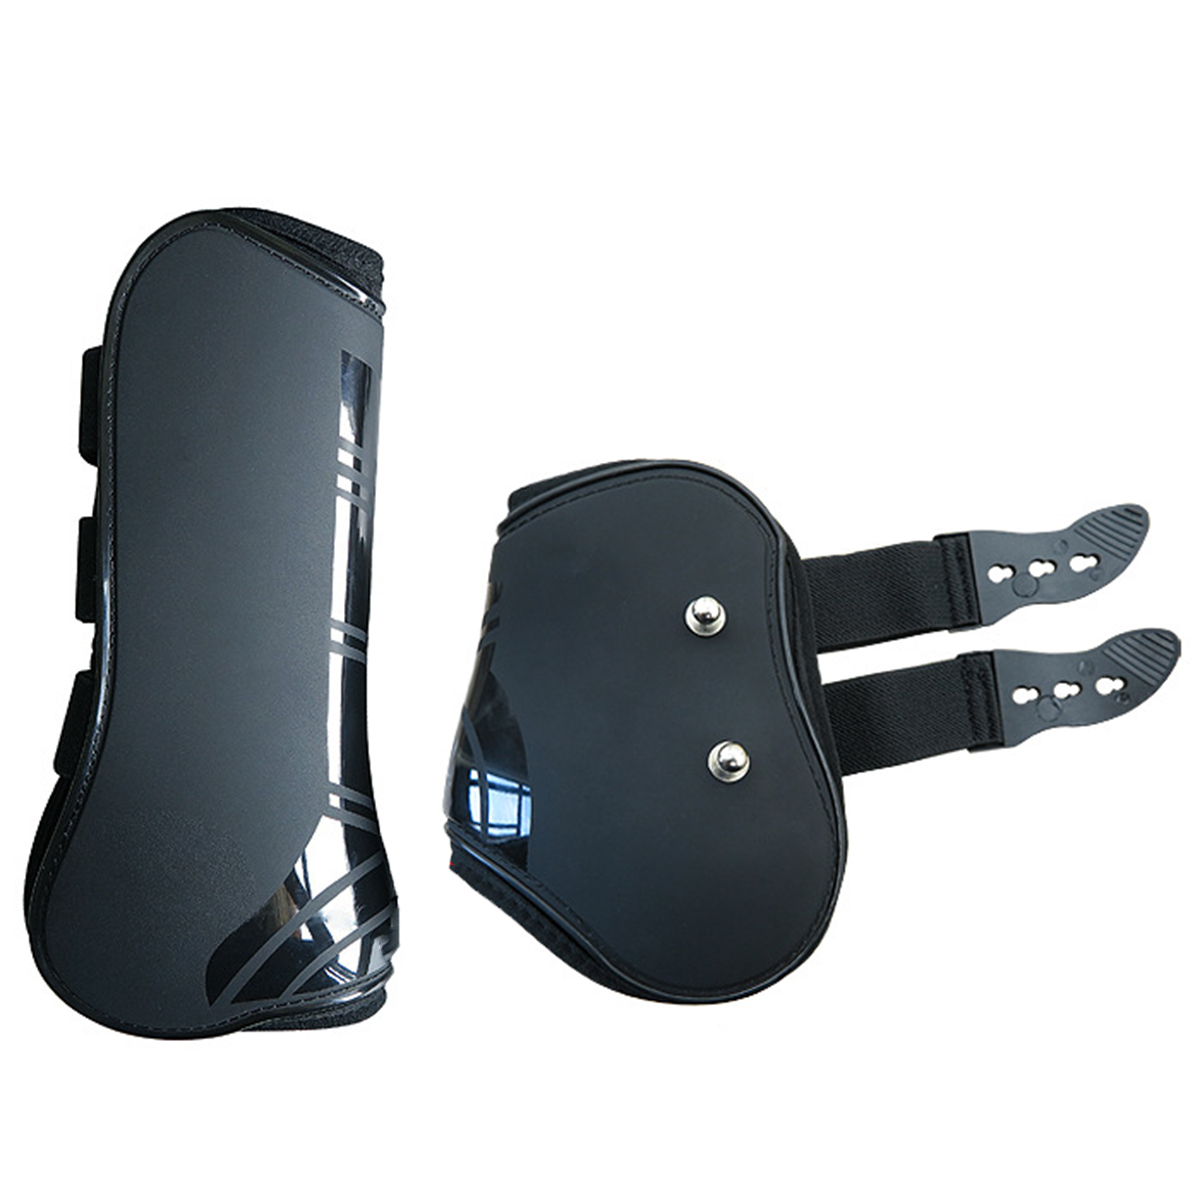 4pcs/Lot Horse Front Hind Leg Boots Adjustable Horse Leg Guard Protector For Equestrian Tendon Protection Horse Leggings